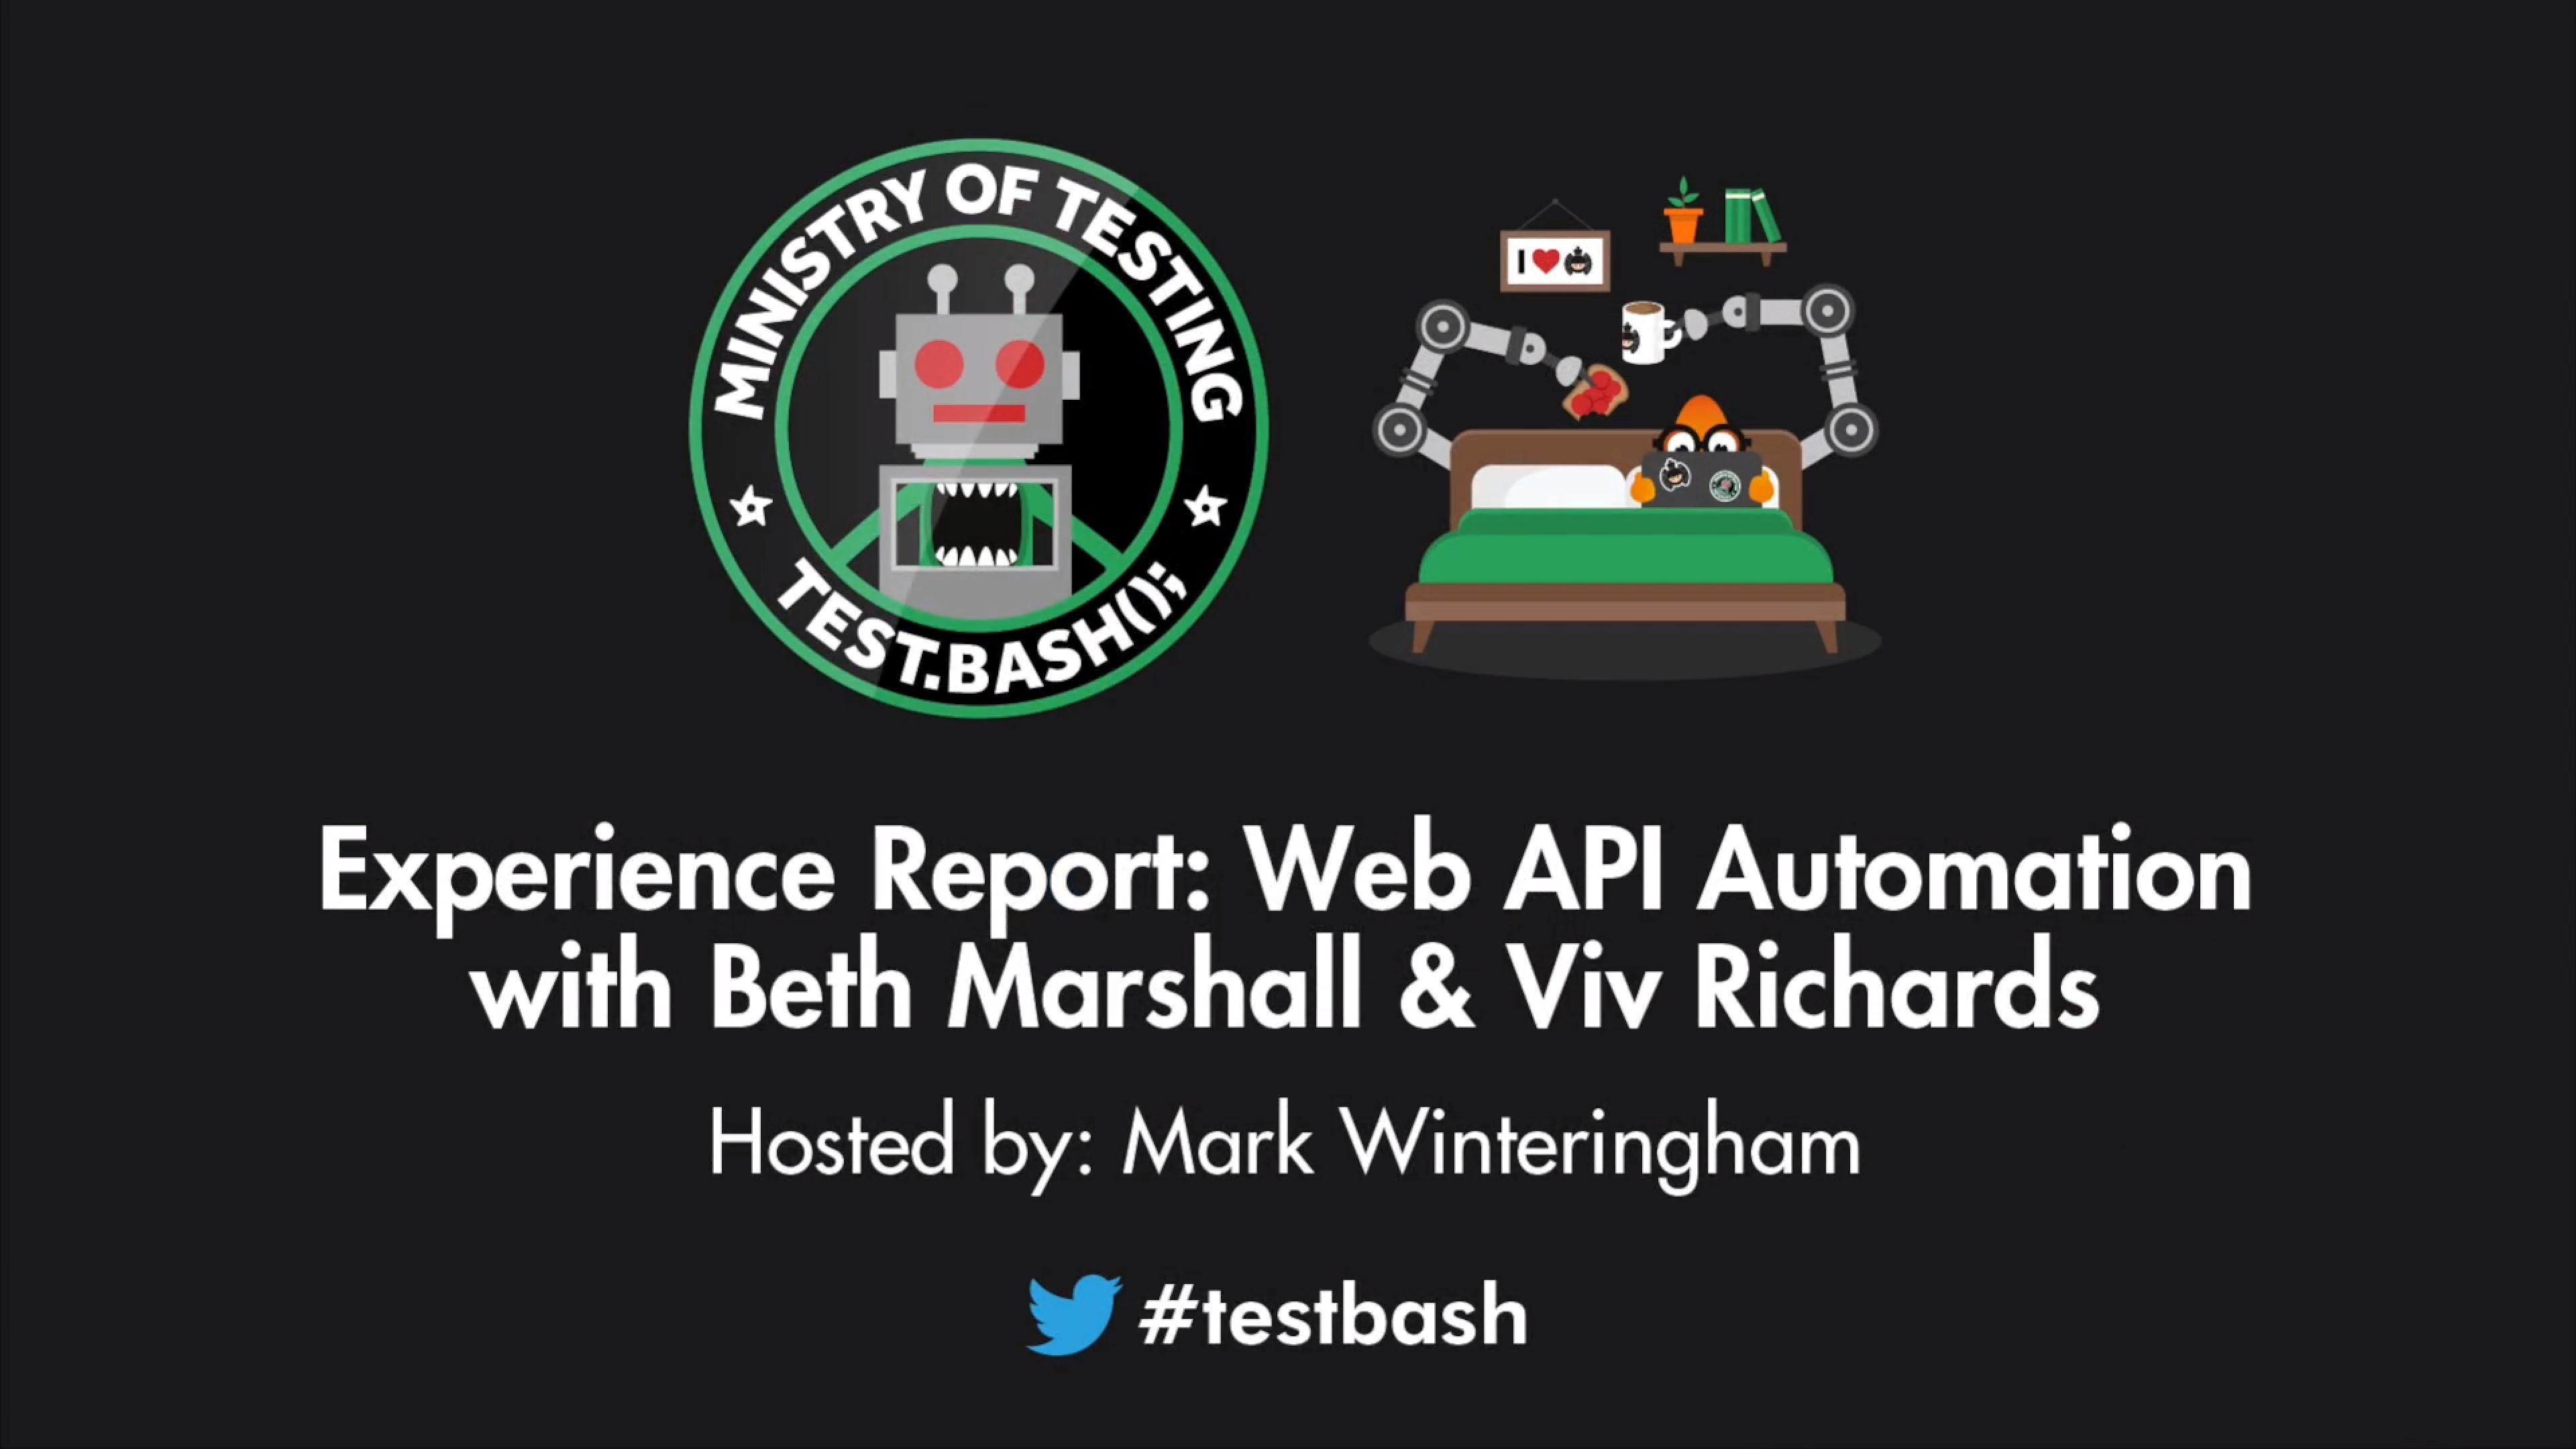 Experience Report: Web API Automation - Beth Marshall & Viv Richards